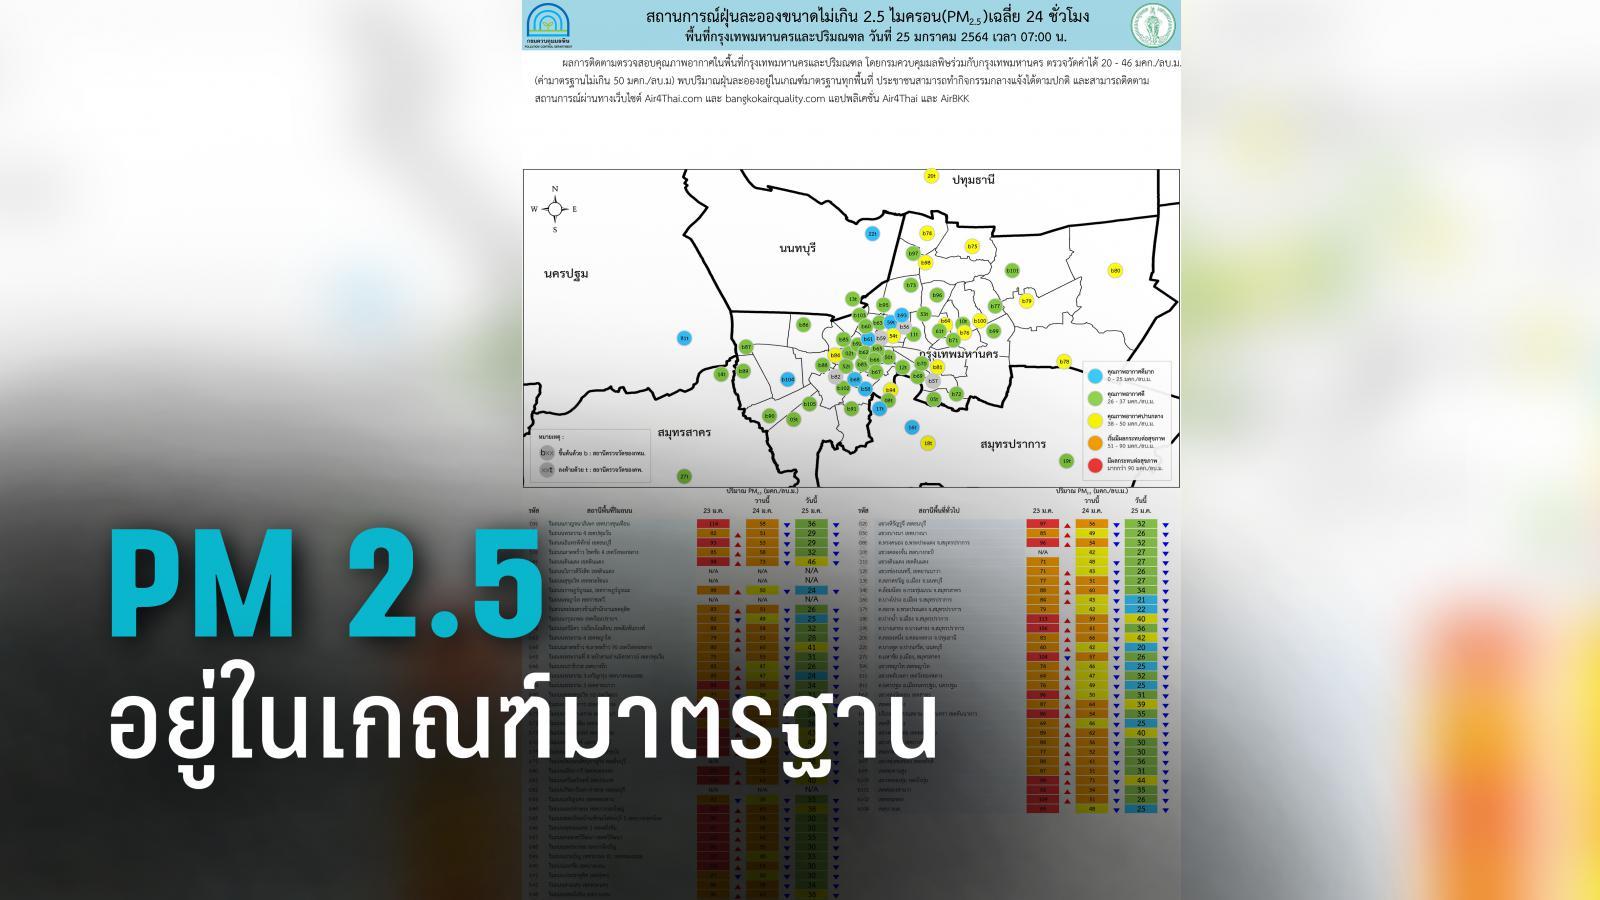 PM 2.5 อยู่ในเกณฑ์มาตรฐานทุกพื้นที่